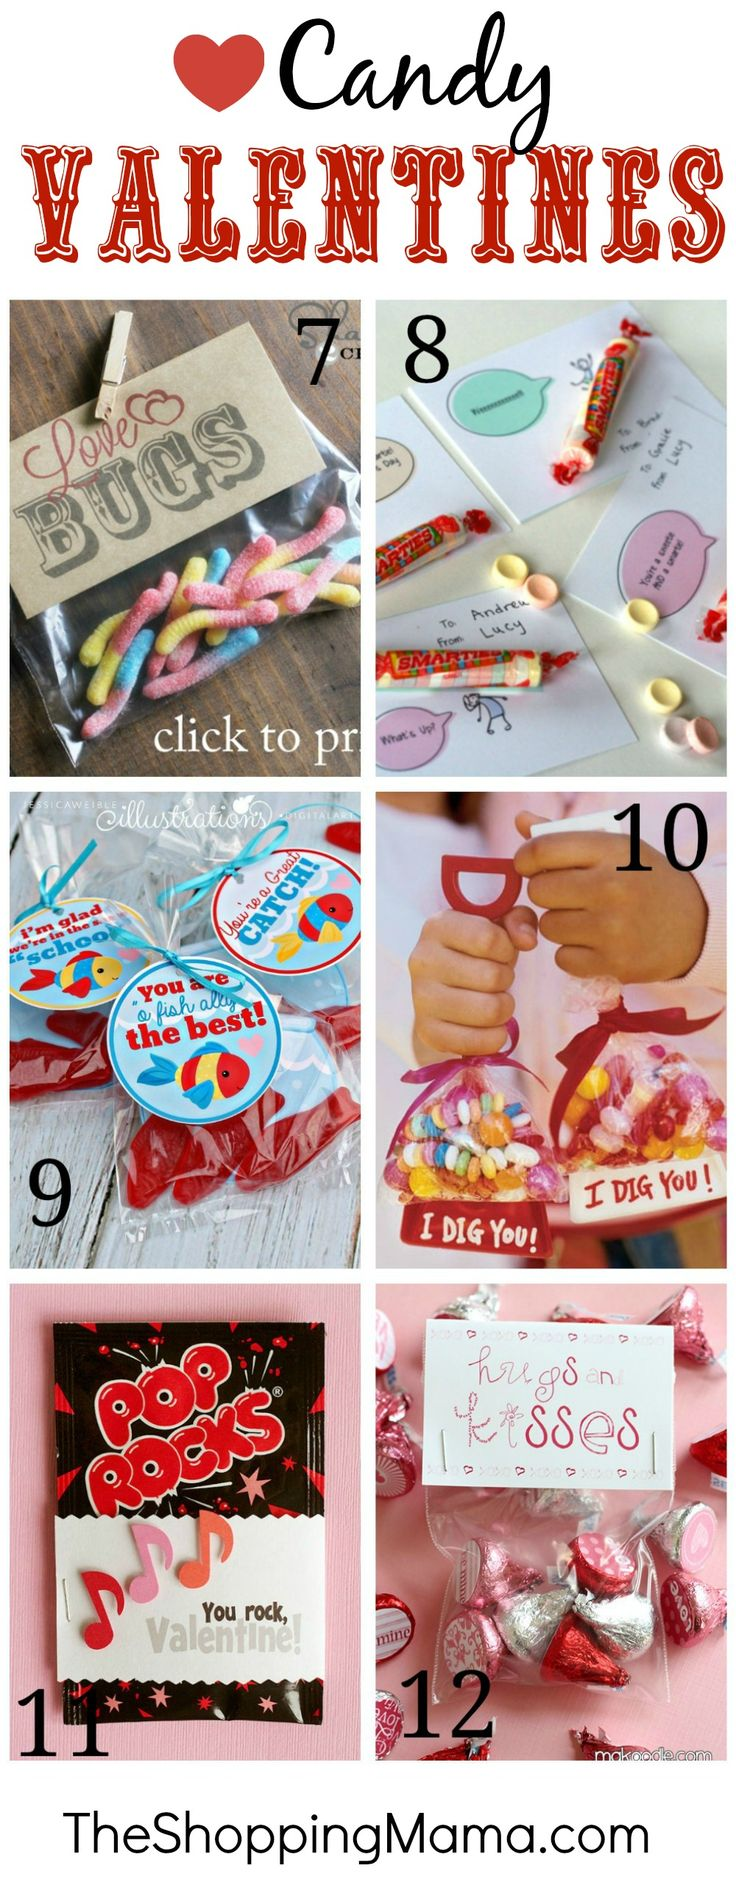 Best Kids Valentine Ideas on PinterestThe Shopping Mama